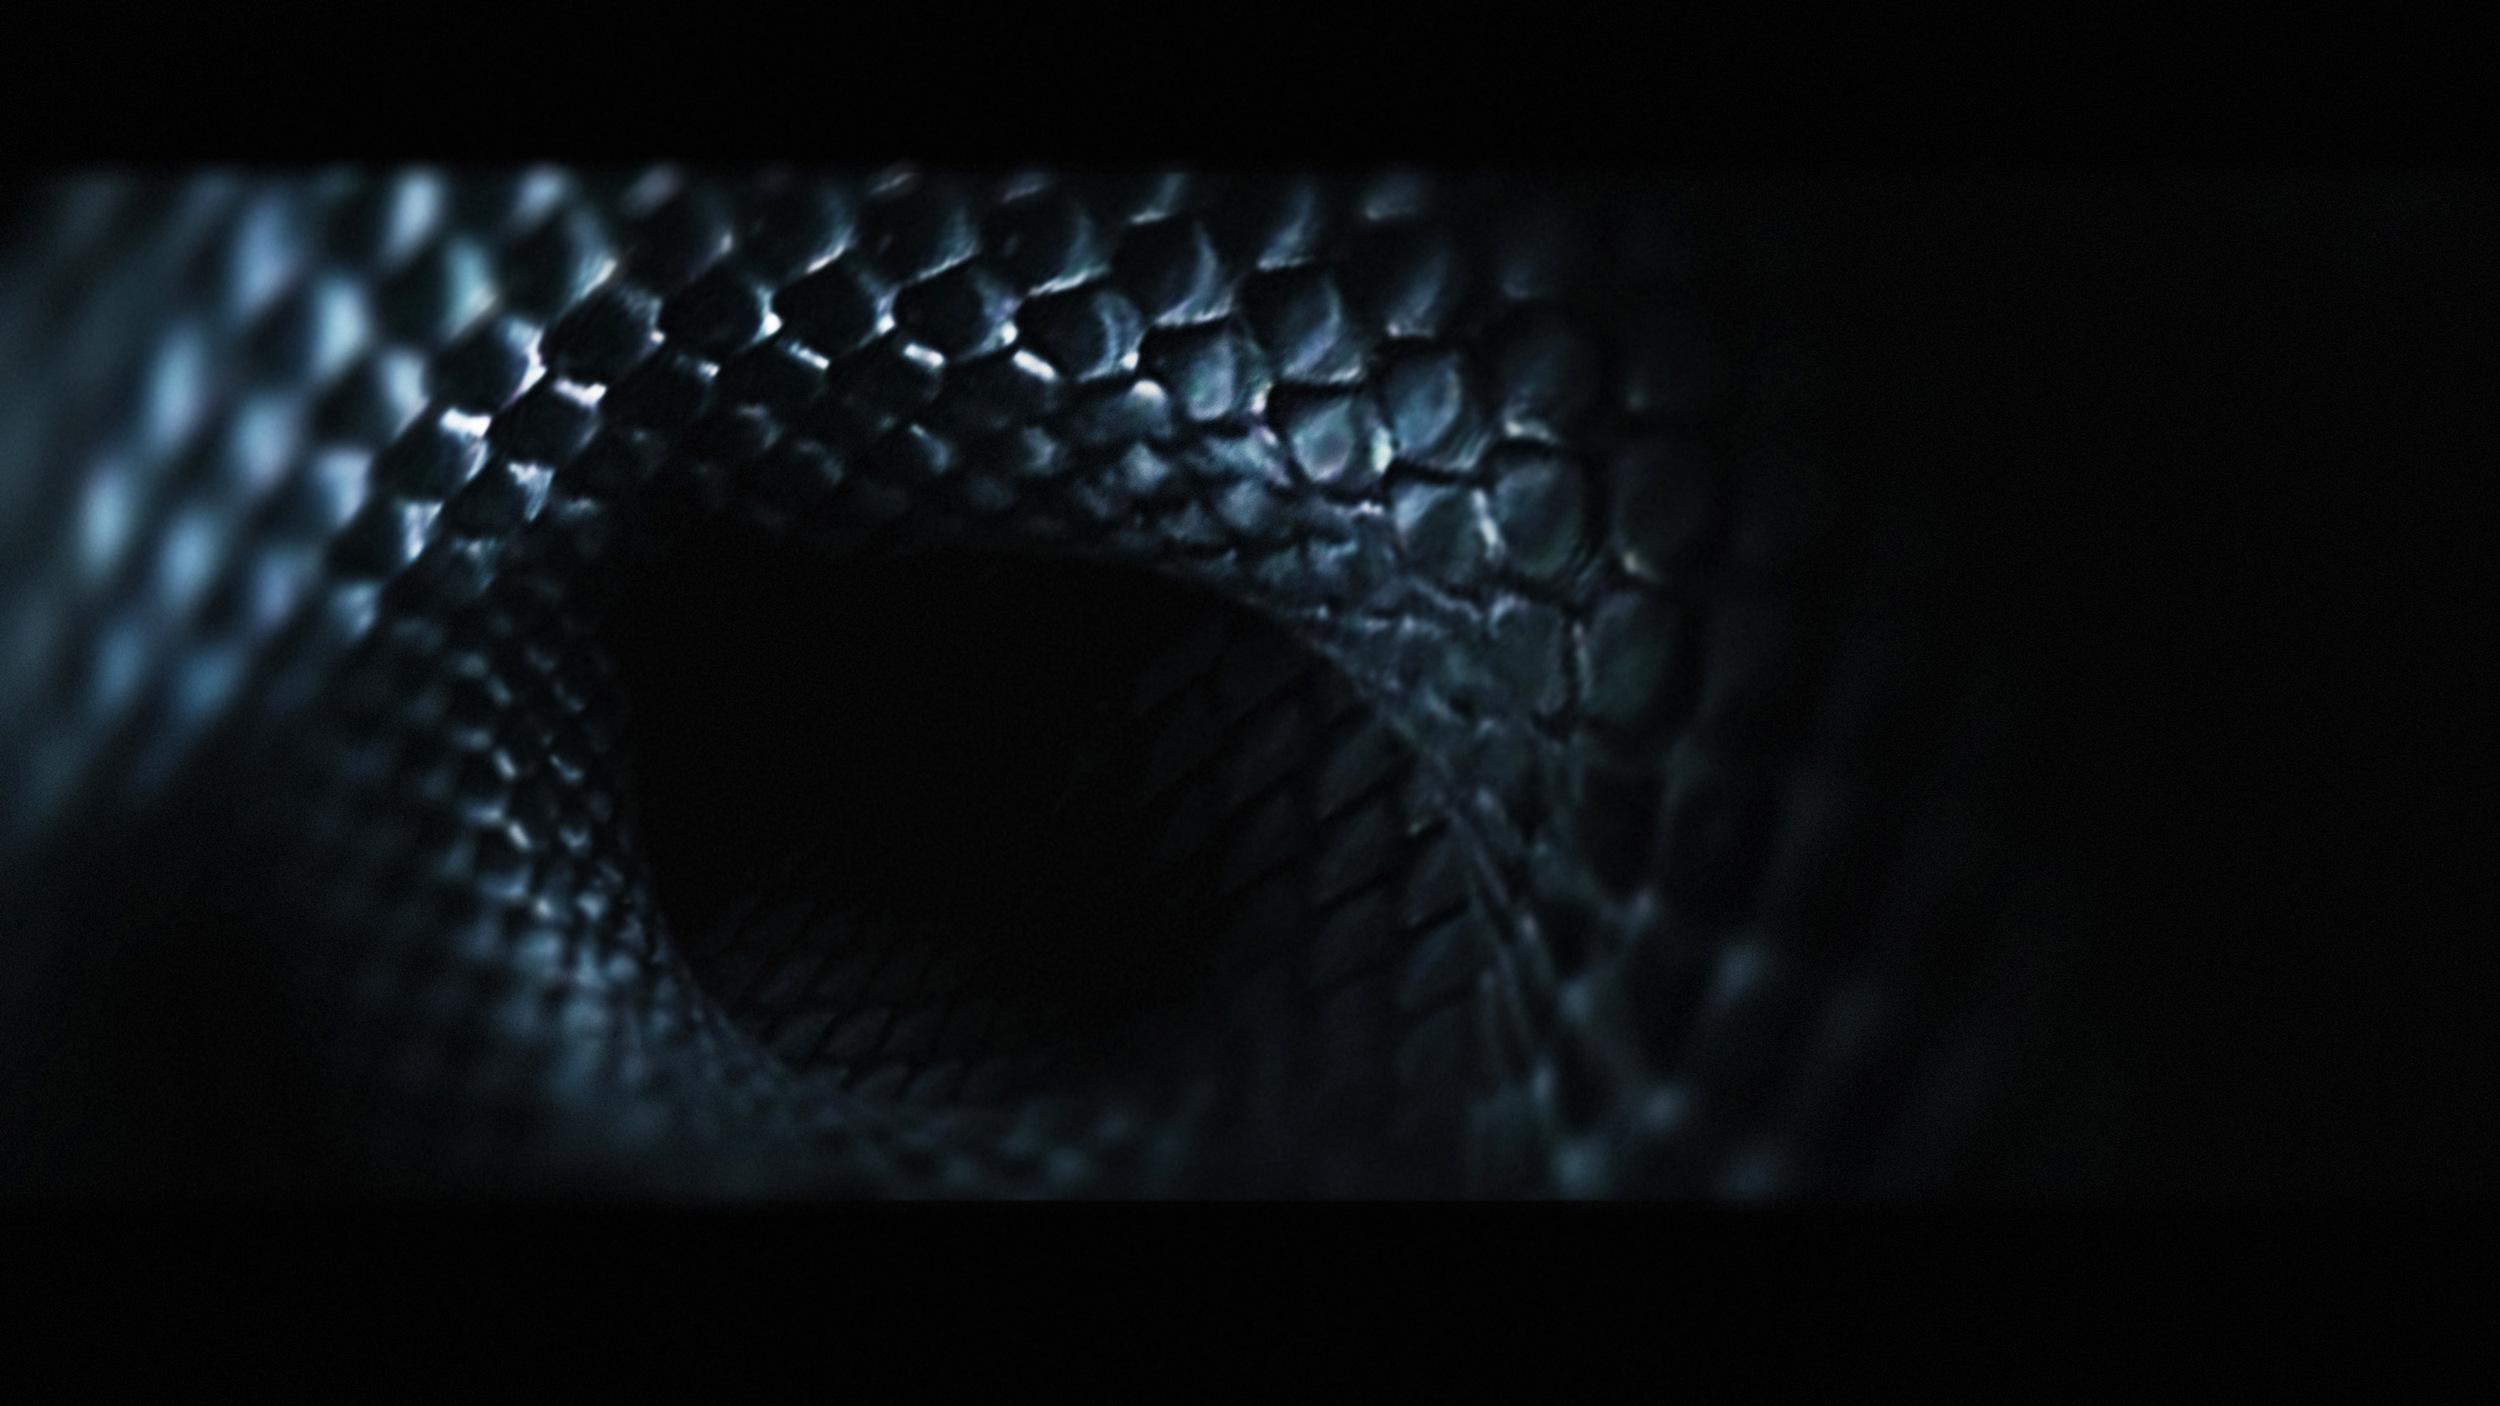 Lauren-Indovina-Penny-Dreadful-Titles-PSYOP-Concept-Art-Snake-2.jpg